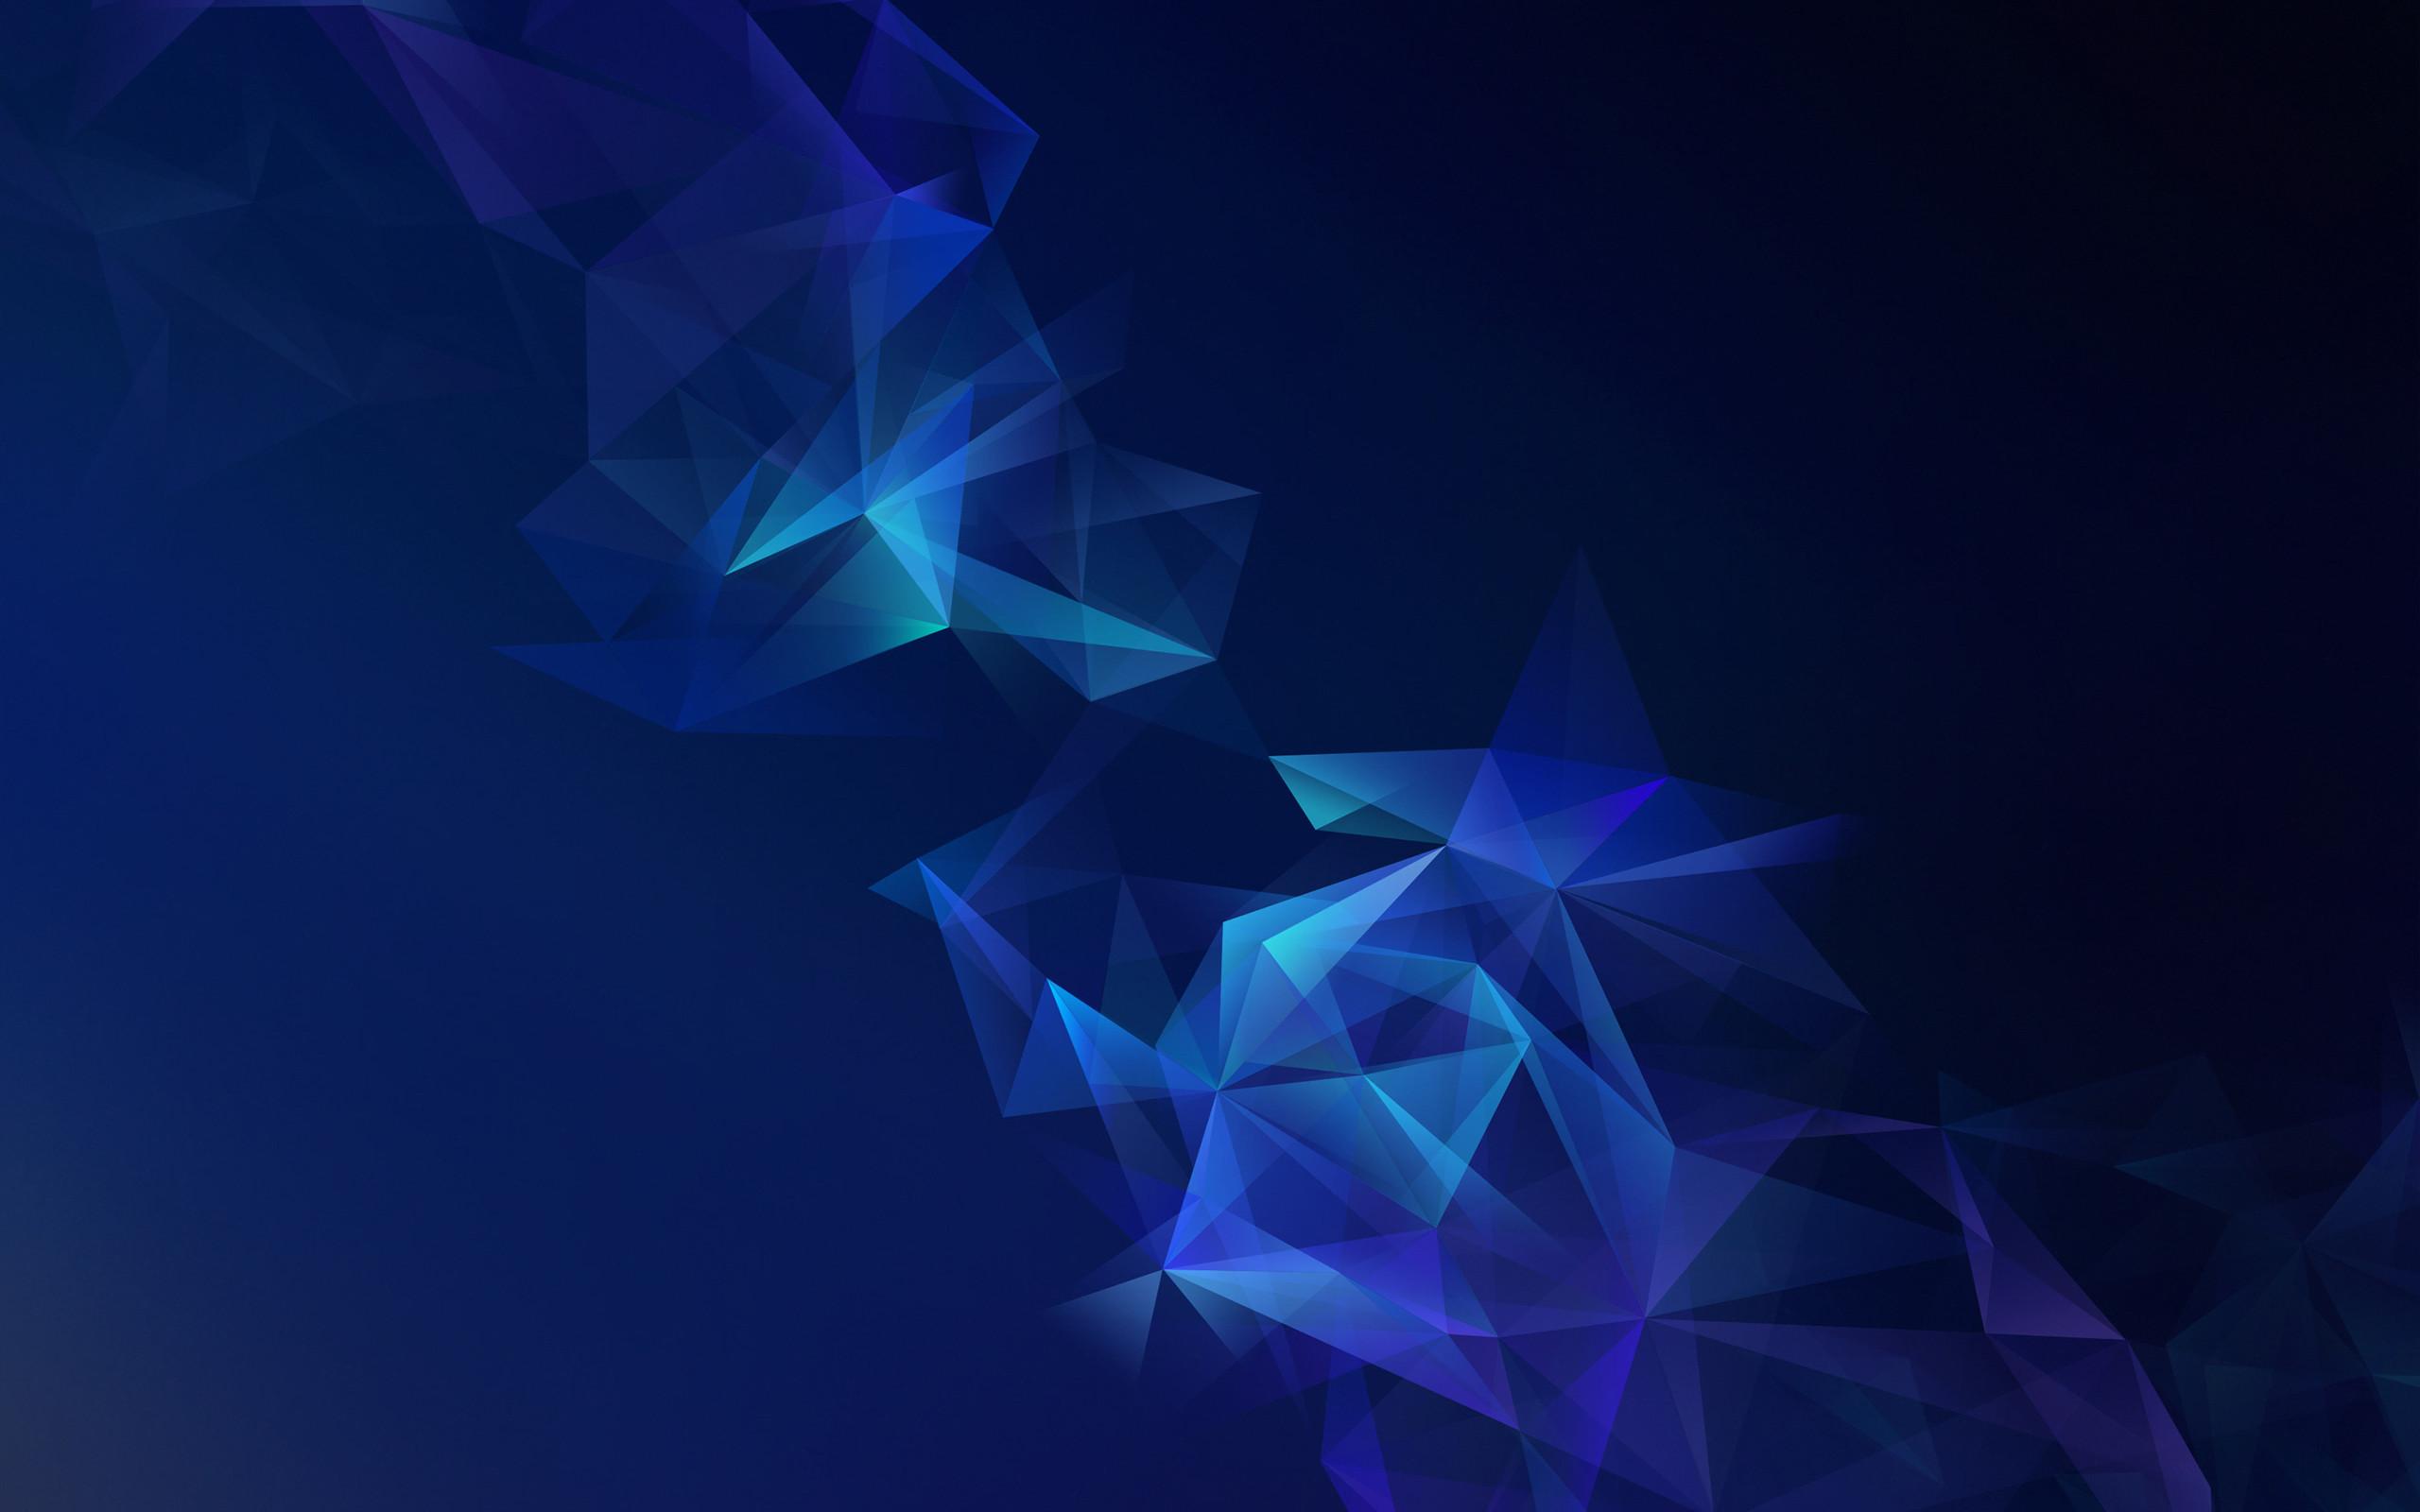 Res: 2560x1600, Tags: Blue Galaxy Samsung Lowpoly